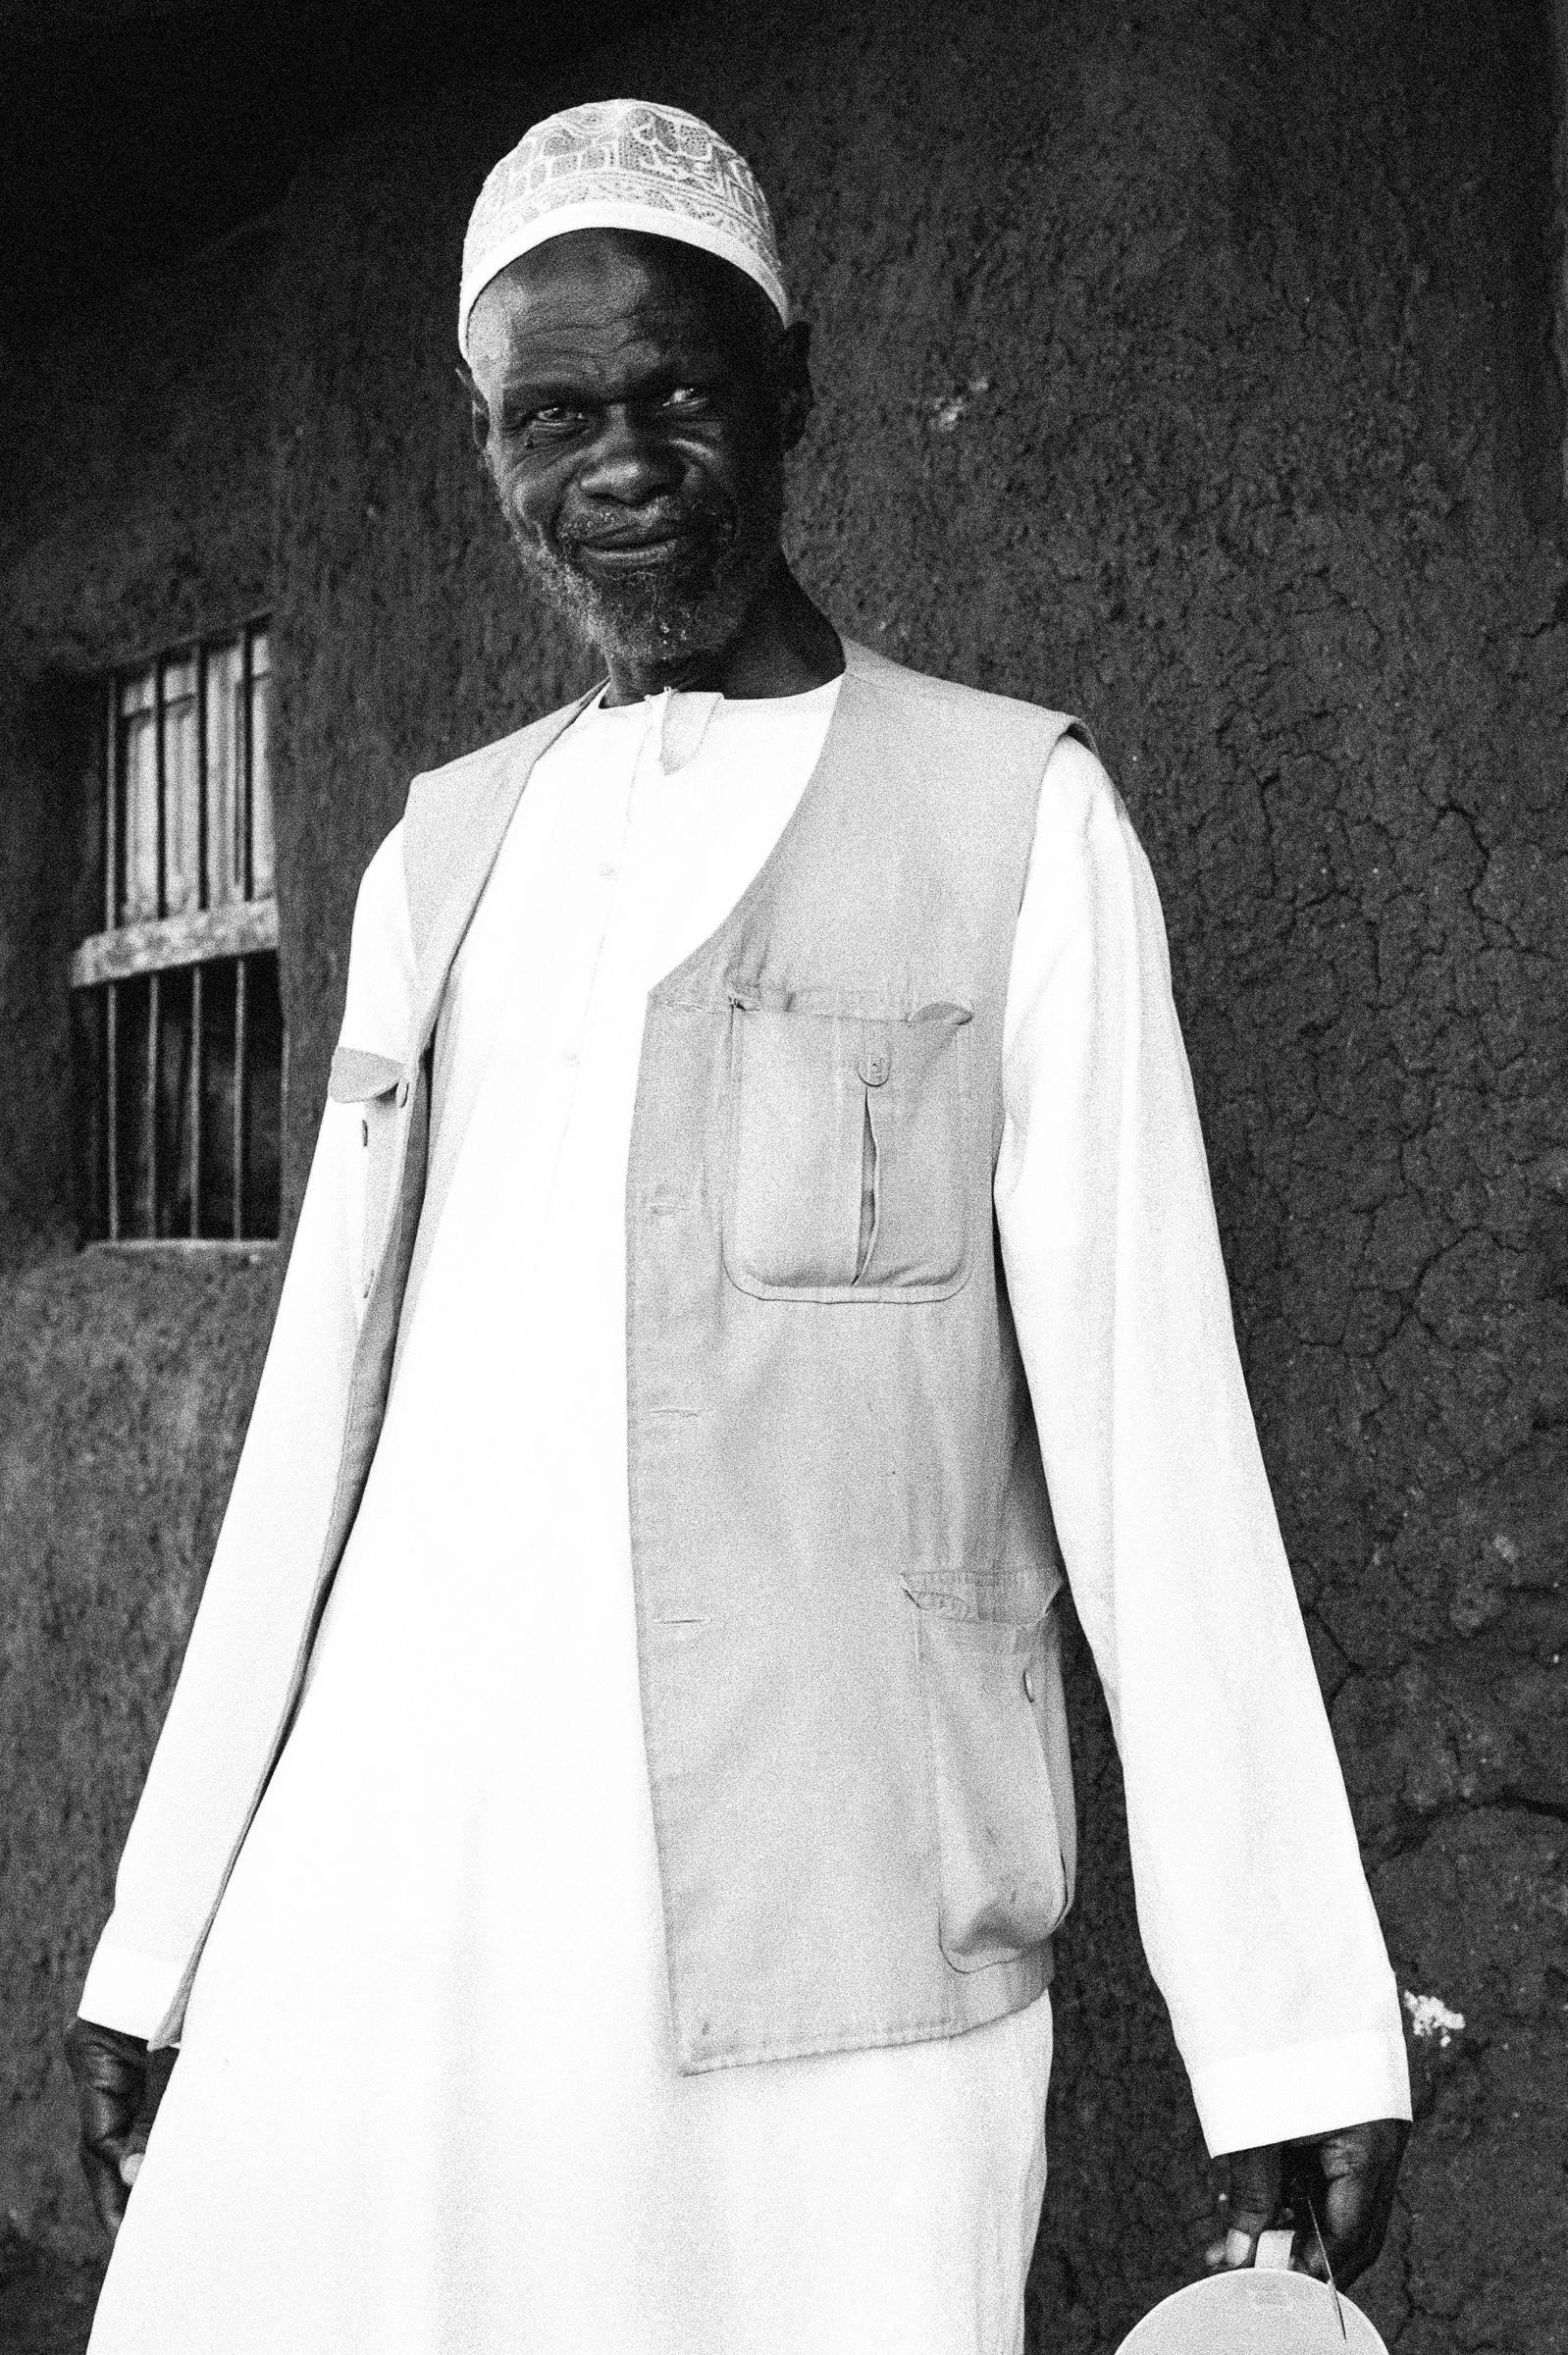 Leyla Jeyte, elder in cargo vest outside his home, 2016. Courtesy of the artist